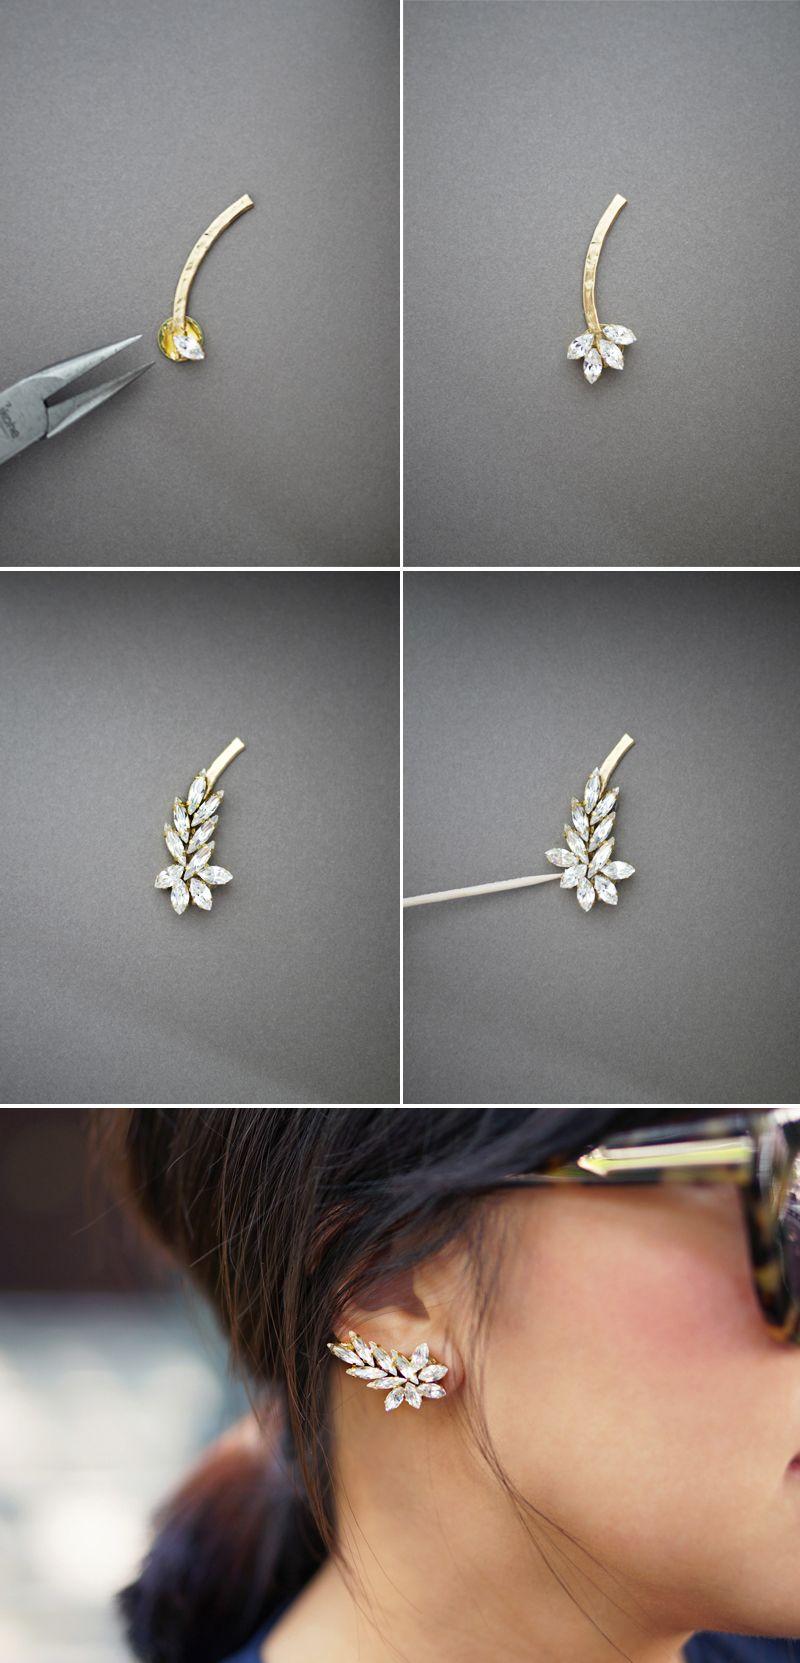 Diy Ear Cuff We Love Pinterest Jewelry Earrings Hazel Glass Eye Silver Wire Wrap Pendant By Kimsjewels On Etsy Tutorial From Honestly Wtf Howto